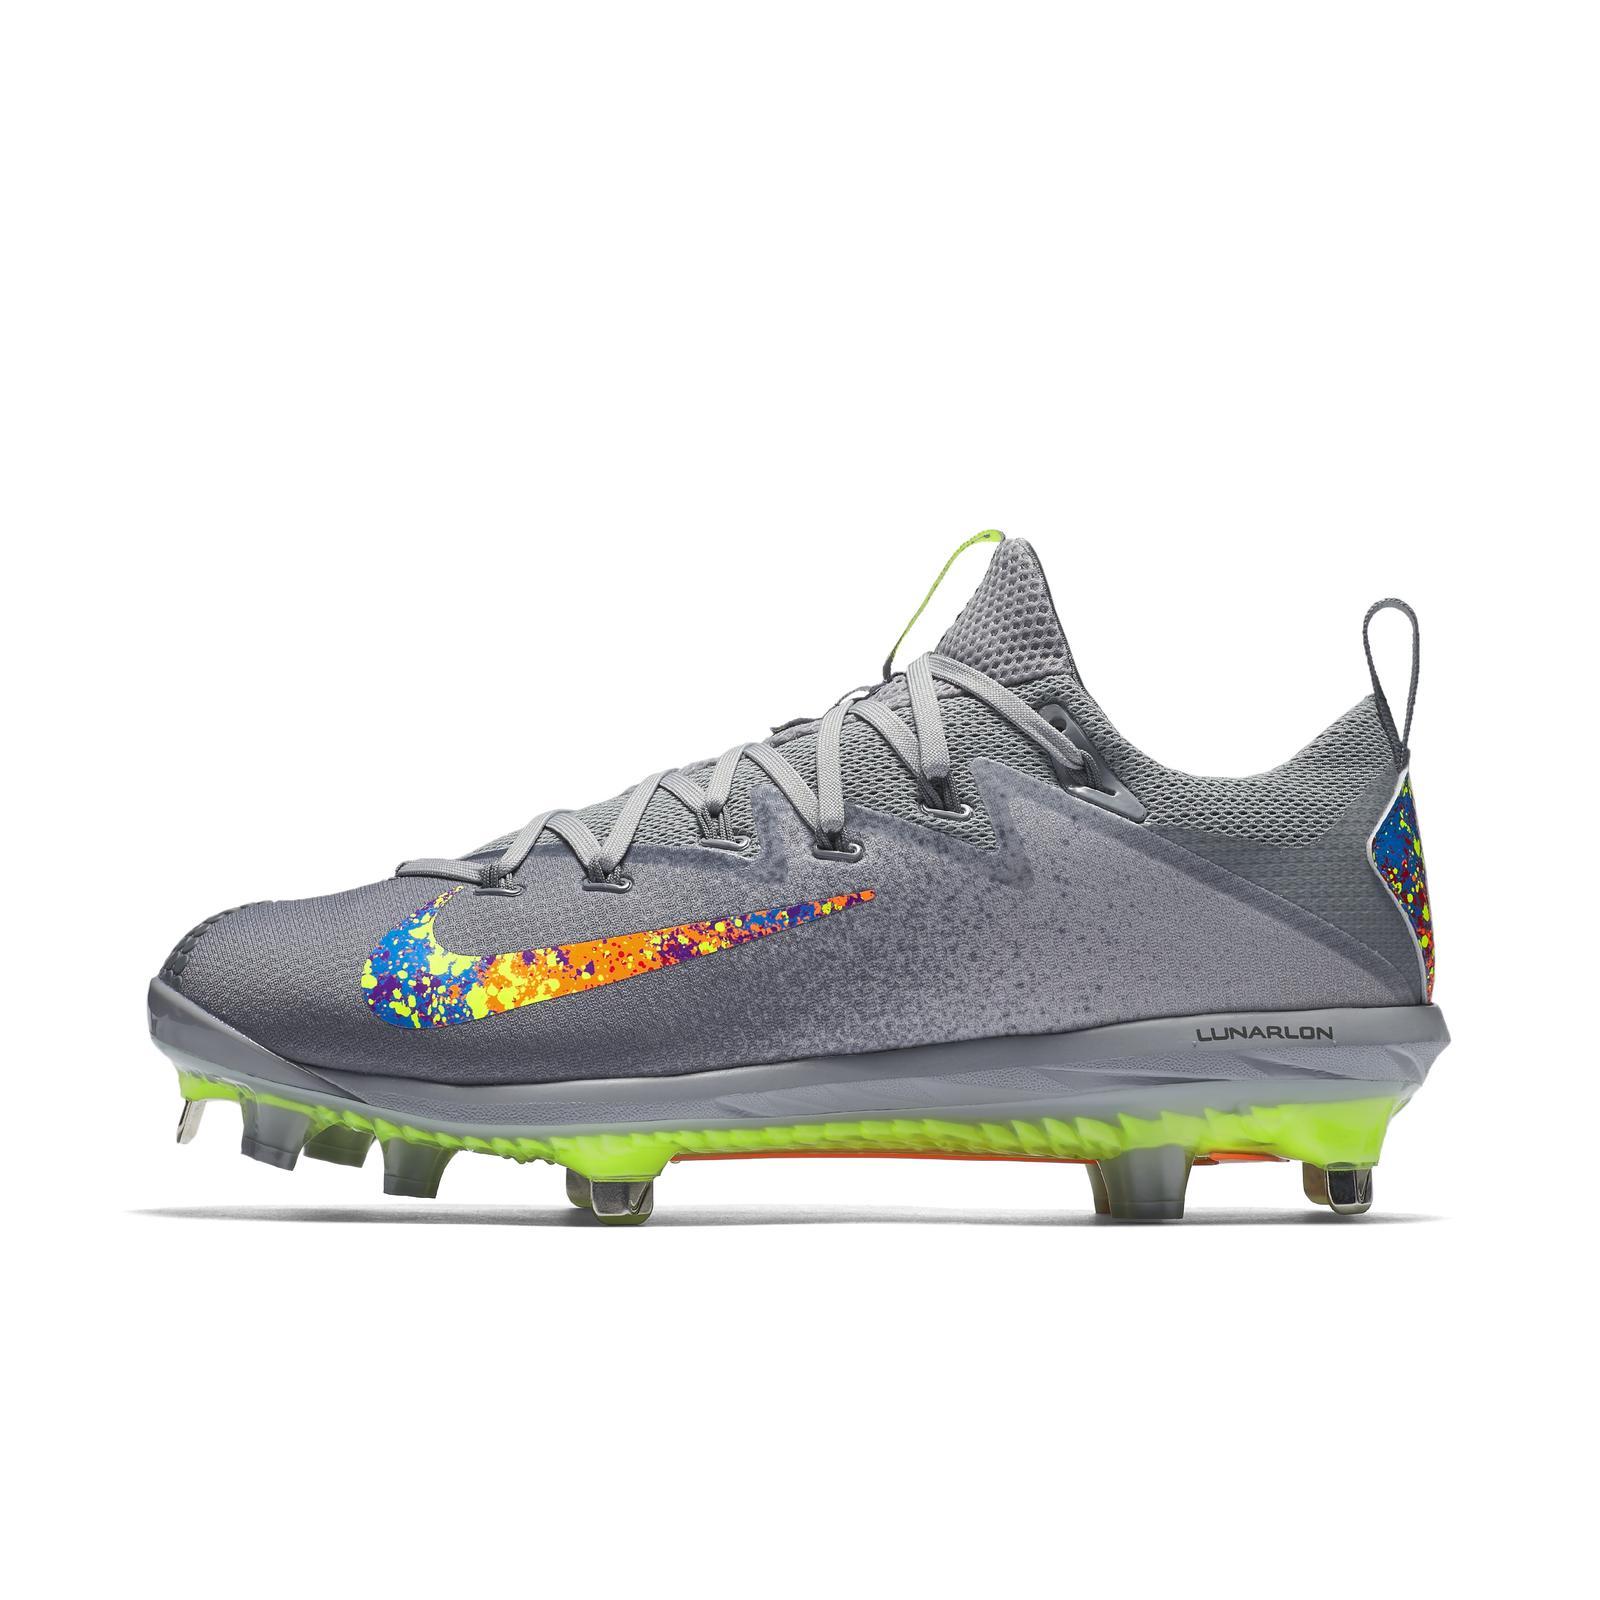 The Nike Vapor Ultrafly